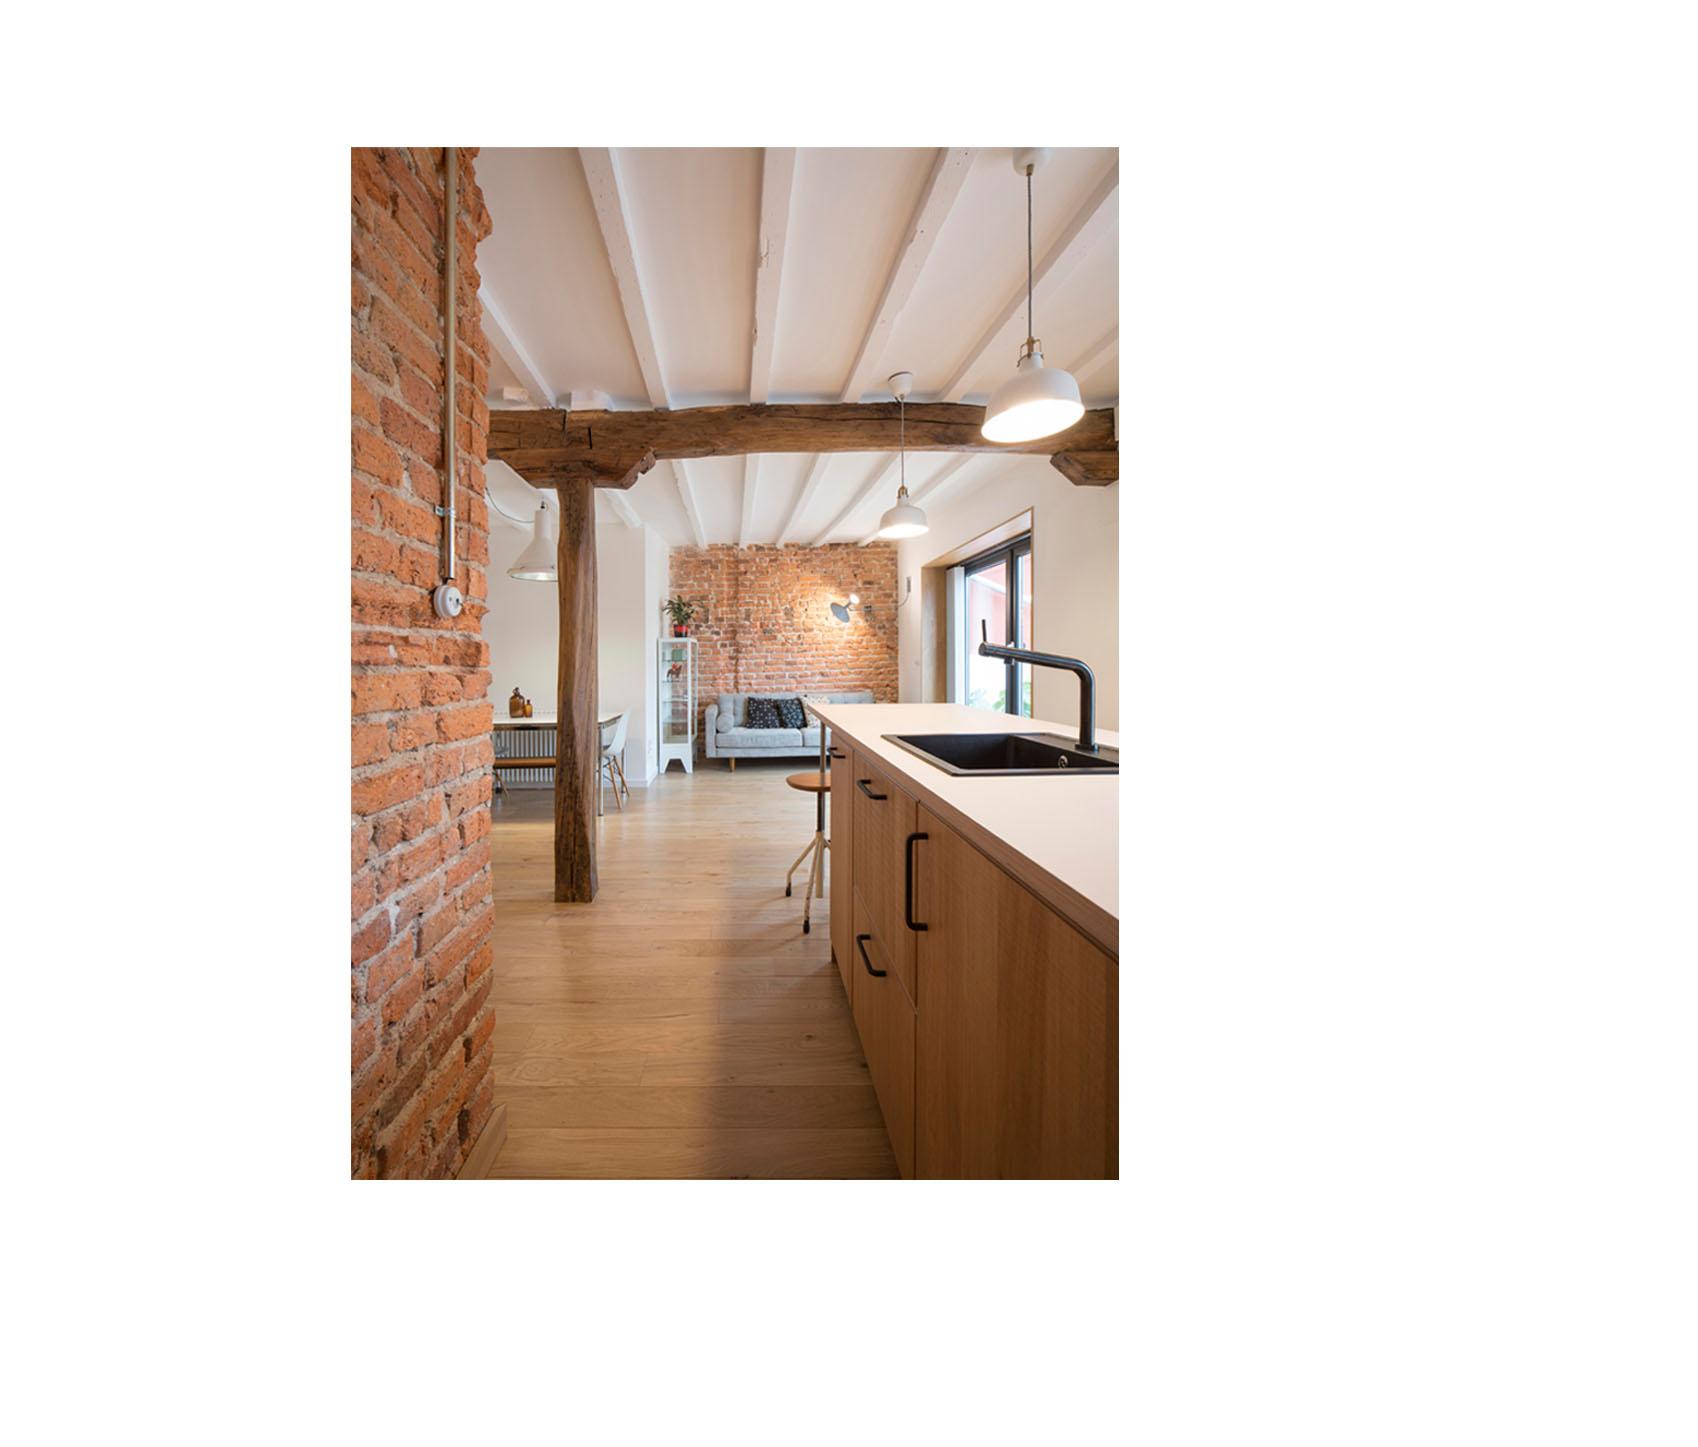 Apartment Iturriza-Bilbao-Image 08.jpg